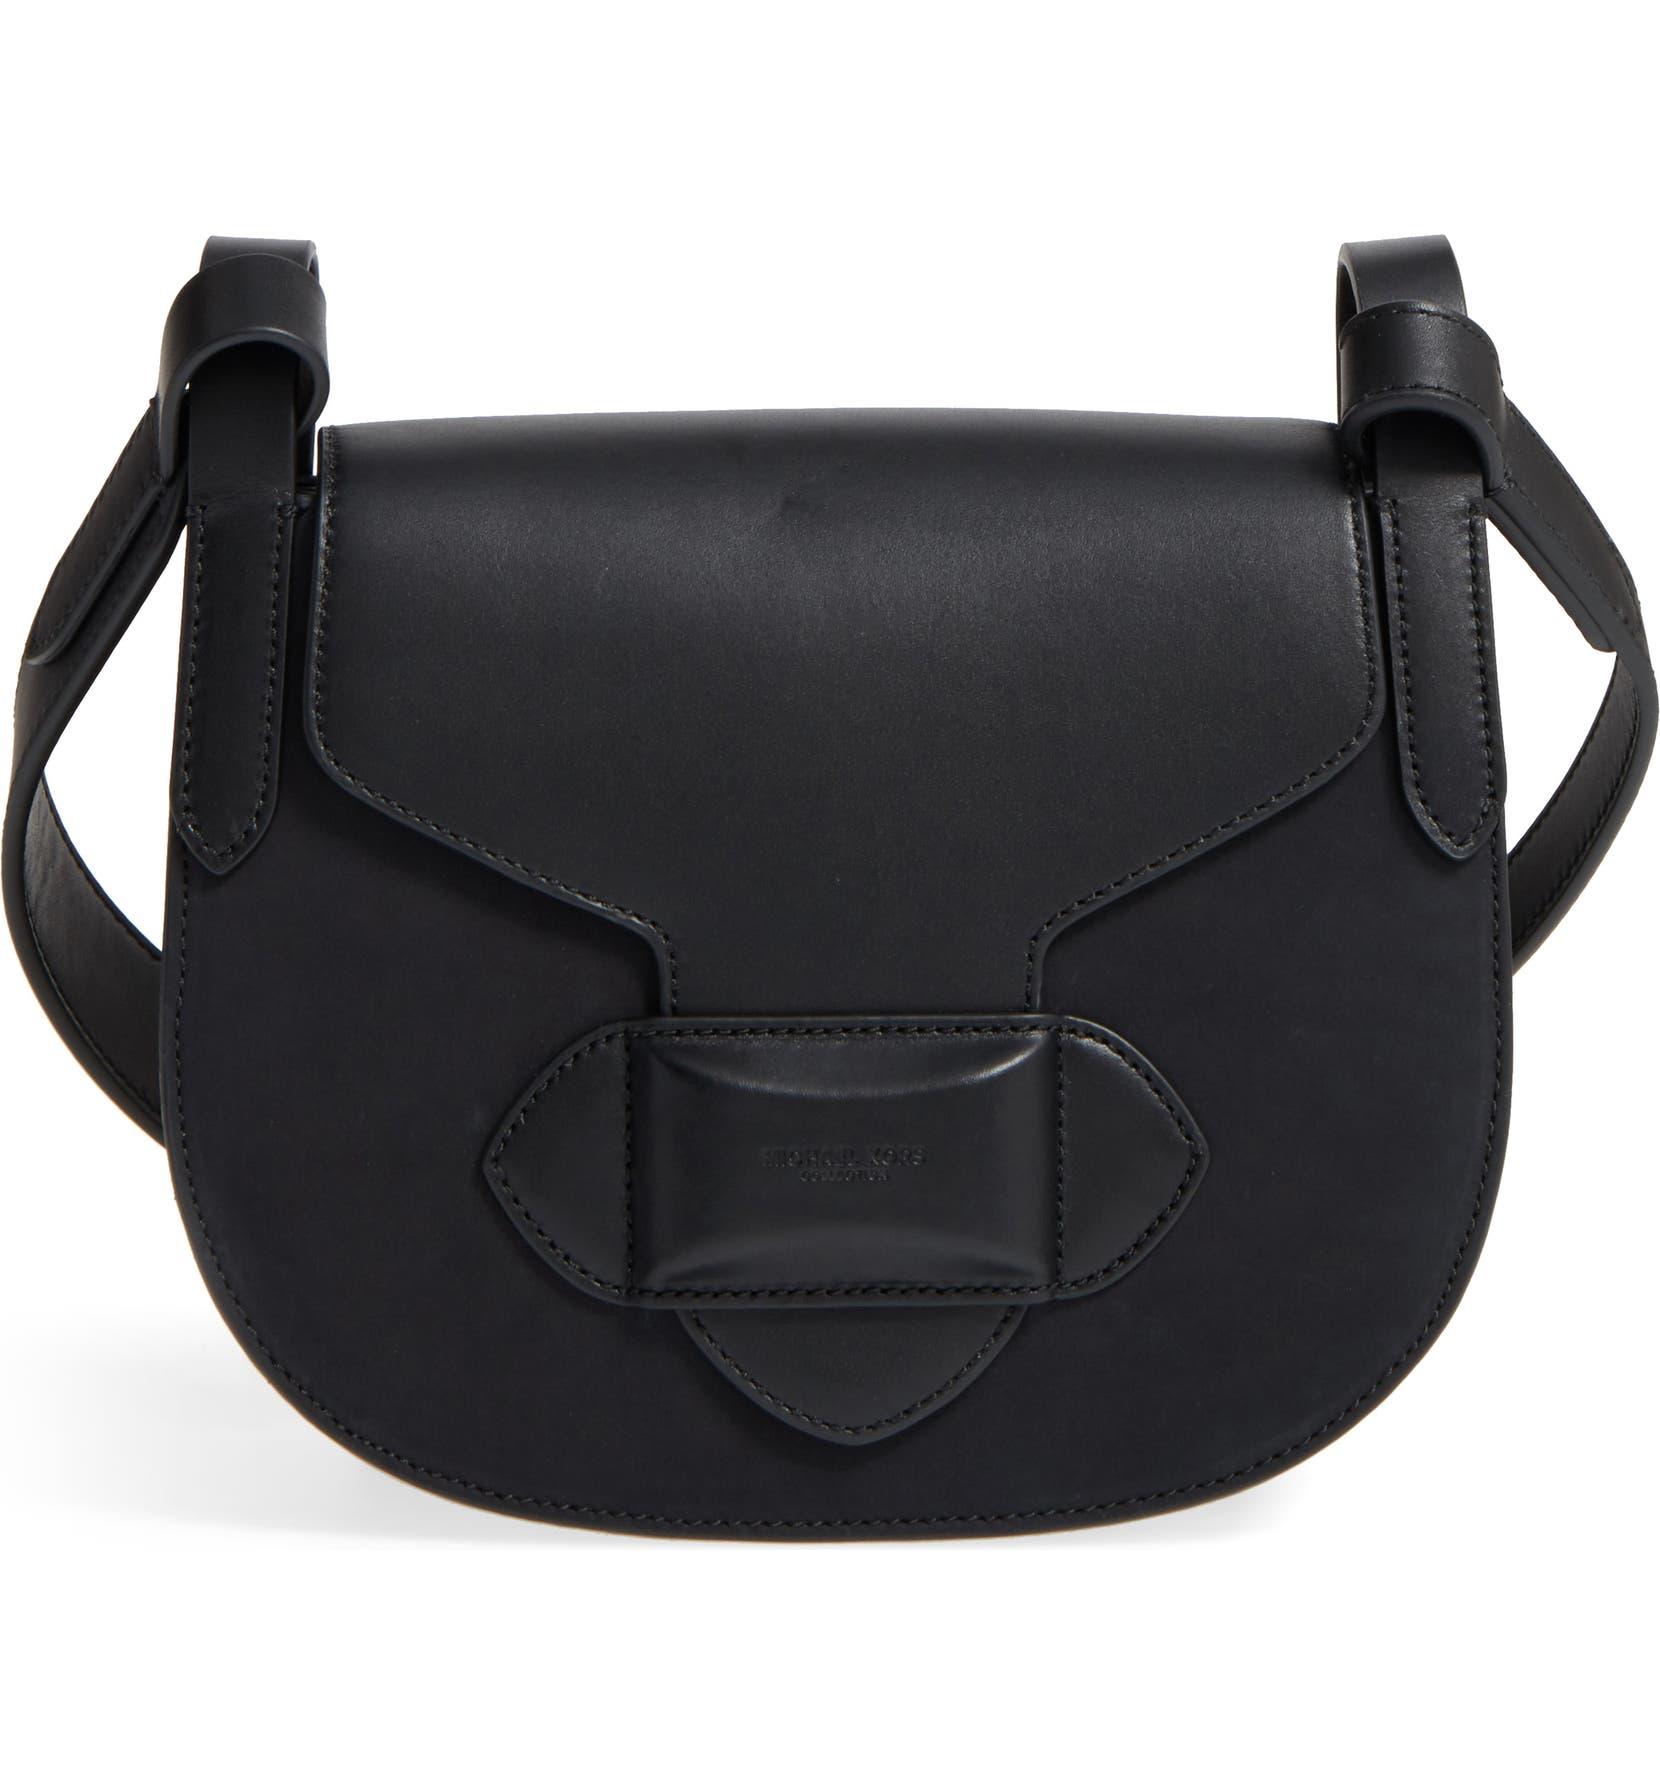 e0c5fb9e51a9 Michael Kors Small Daria Leather Crossbody Bag   Nordstrom